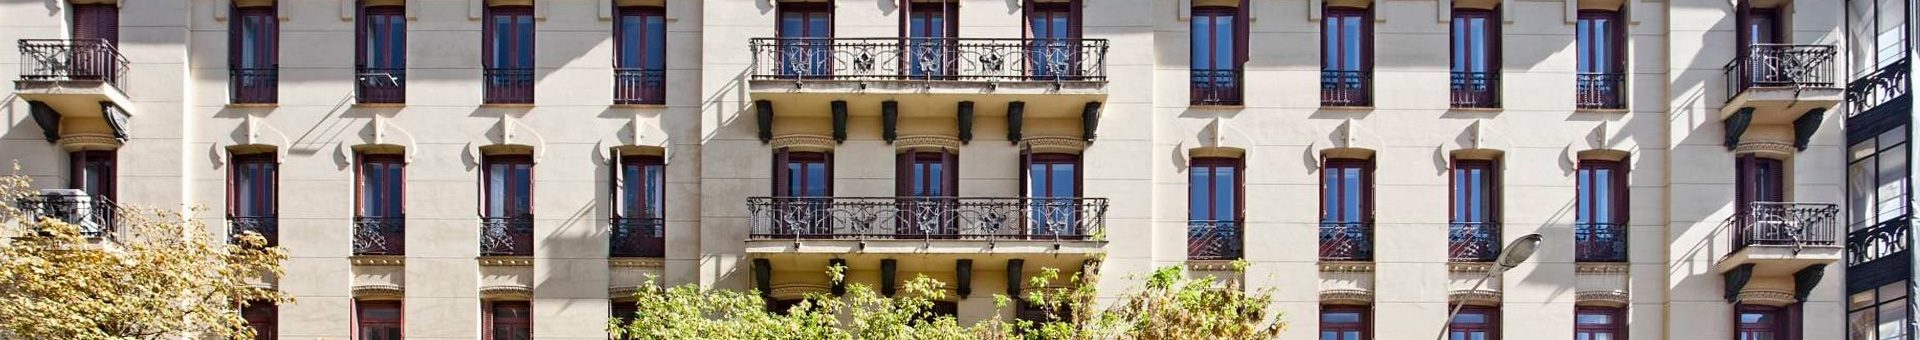 rehabilitacion-edificios-massanassai